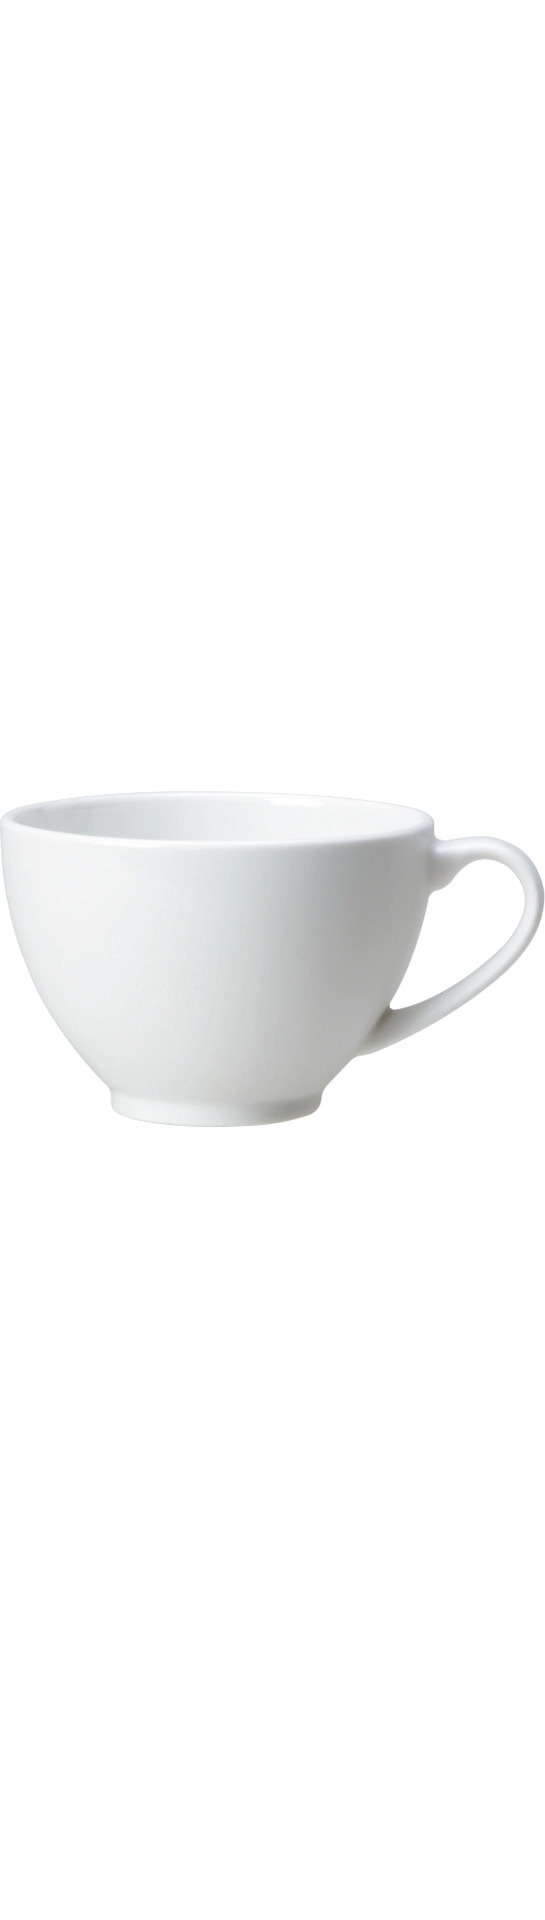 Espressotasse Fine 0,09 l weiß